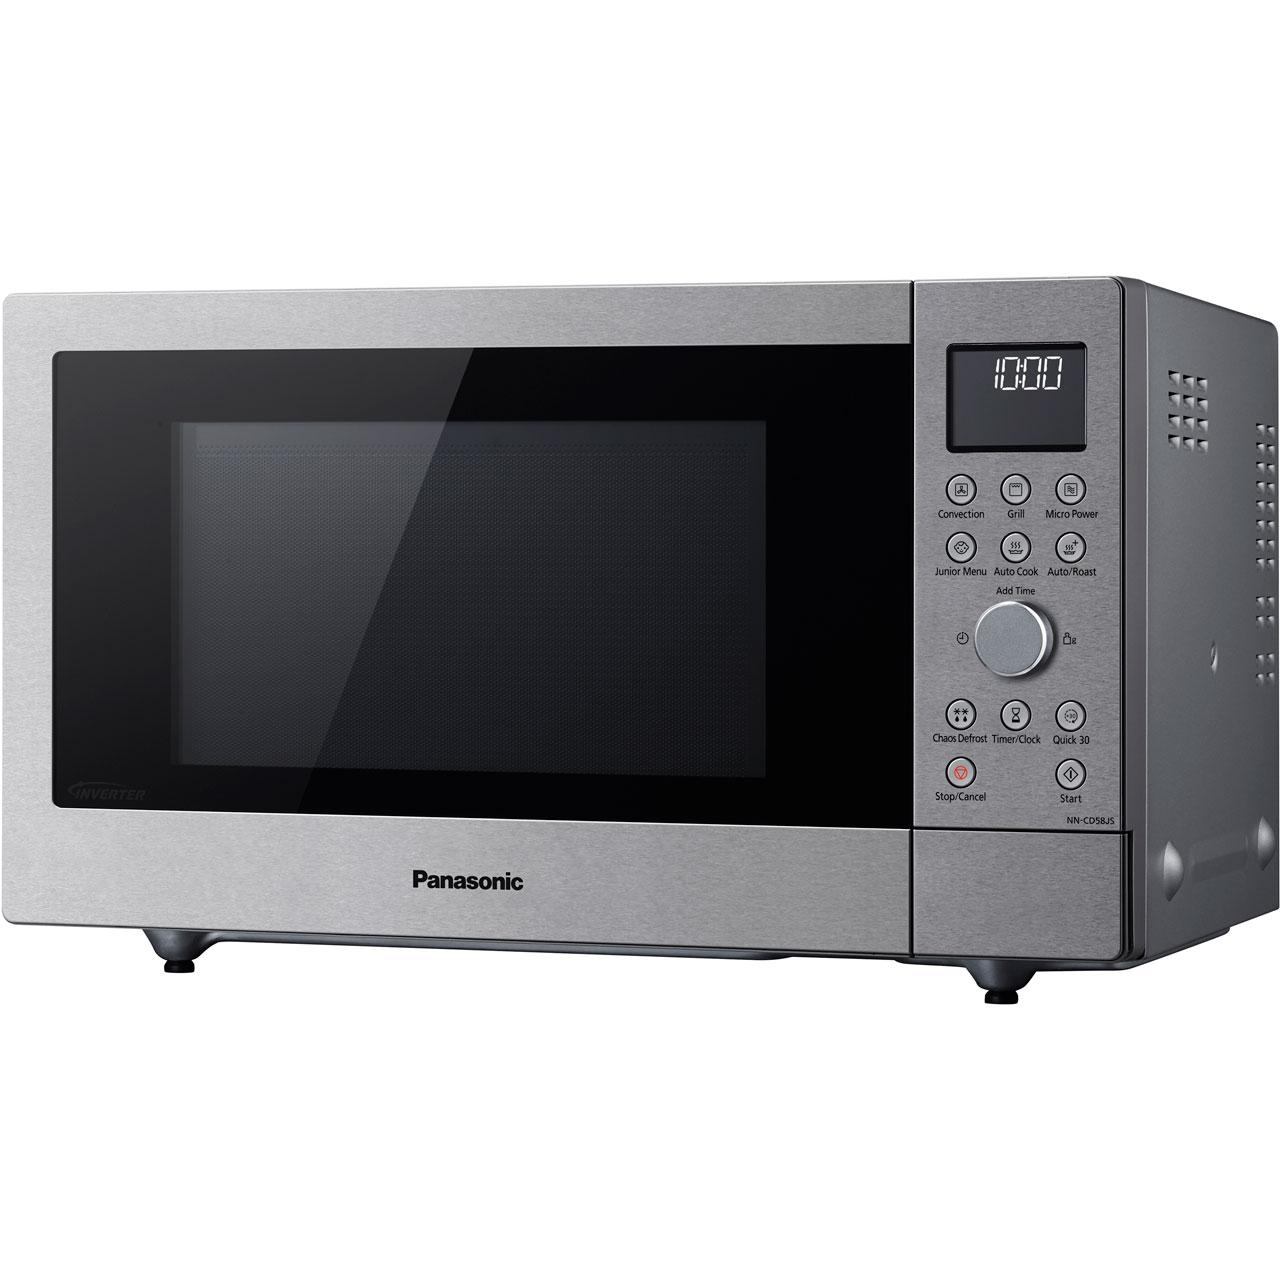 Panasonic Nn Cd58jsbpq 1000 Watt Microwave Free Standing